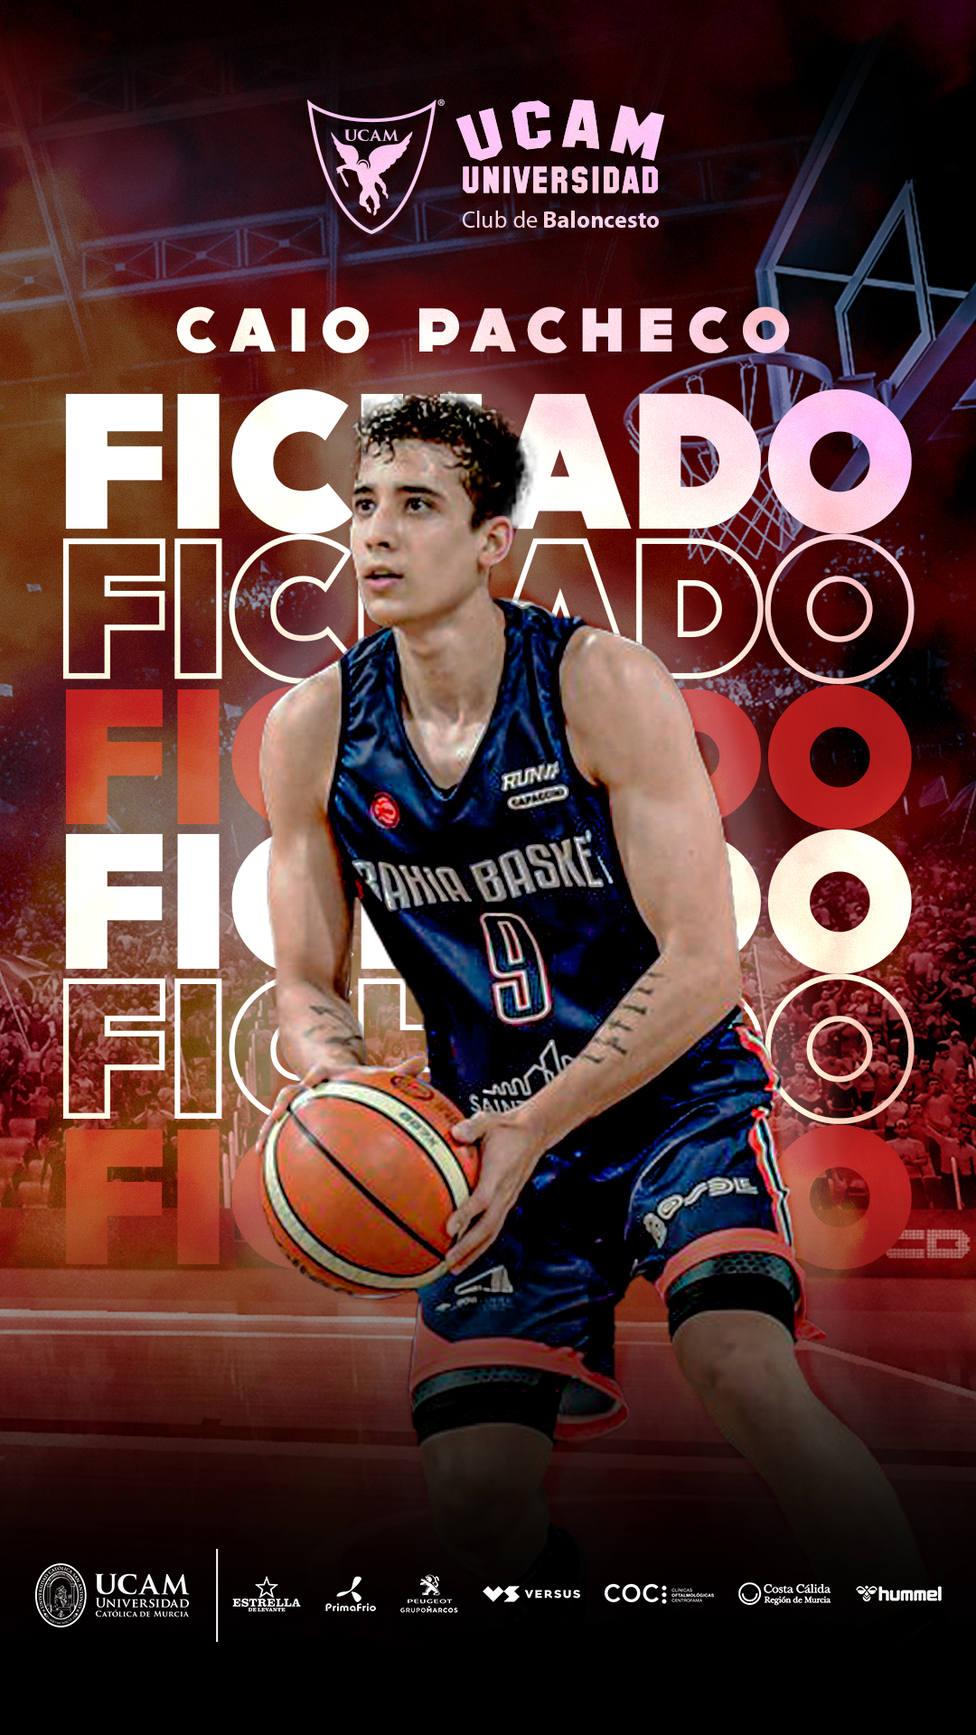 UCAM Murcia CB incorpora al base brasileño Caio Pacheco